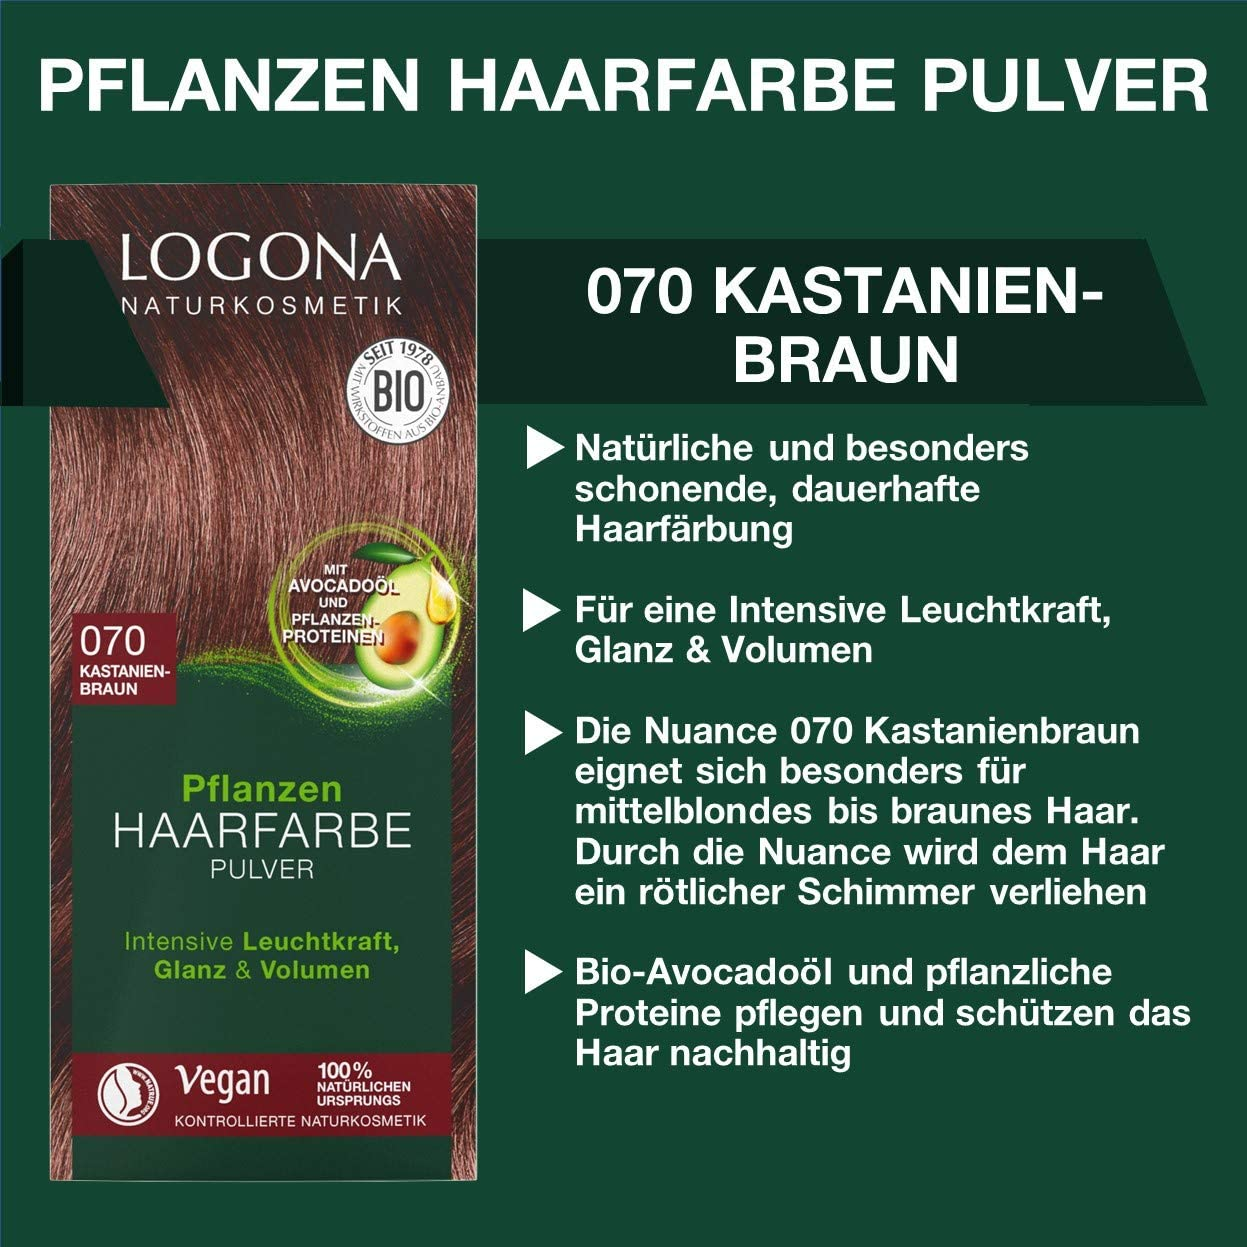 LOGONA Naturkosmetik - Tinte para el cabello en polvo 070 castaño, con aceite de aguacate, vegano y natural, color marrón natural con henna, ...